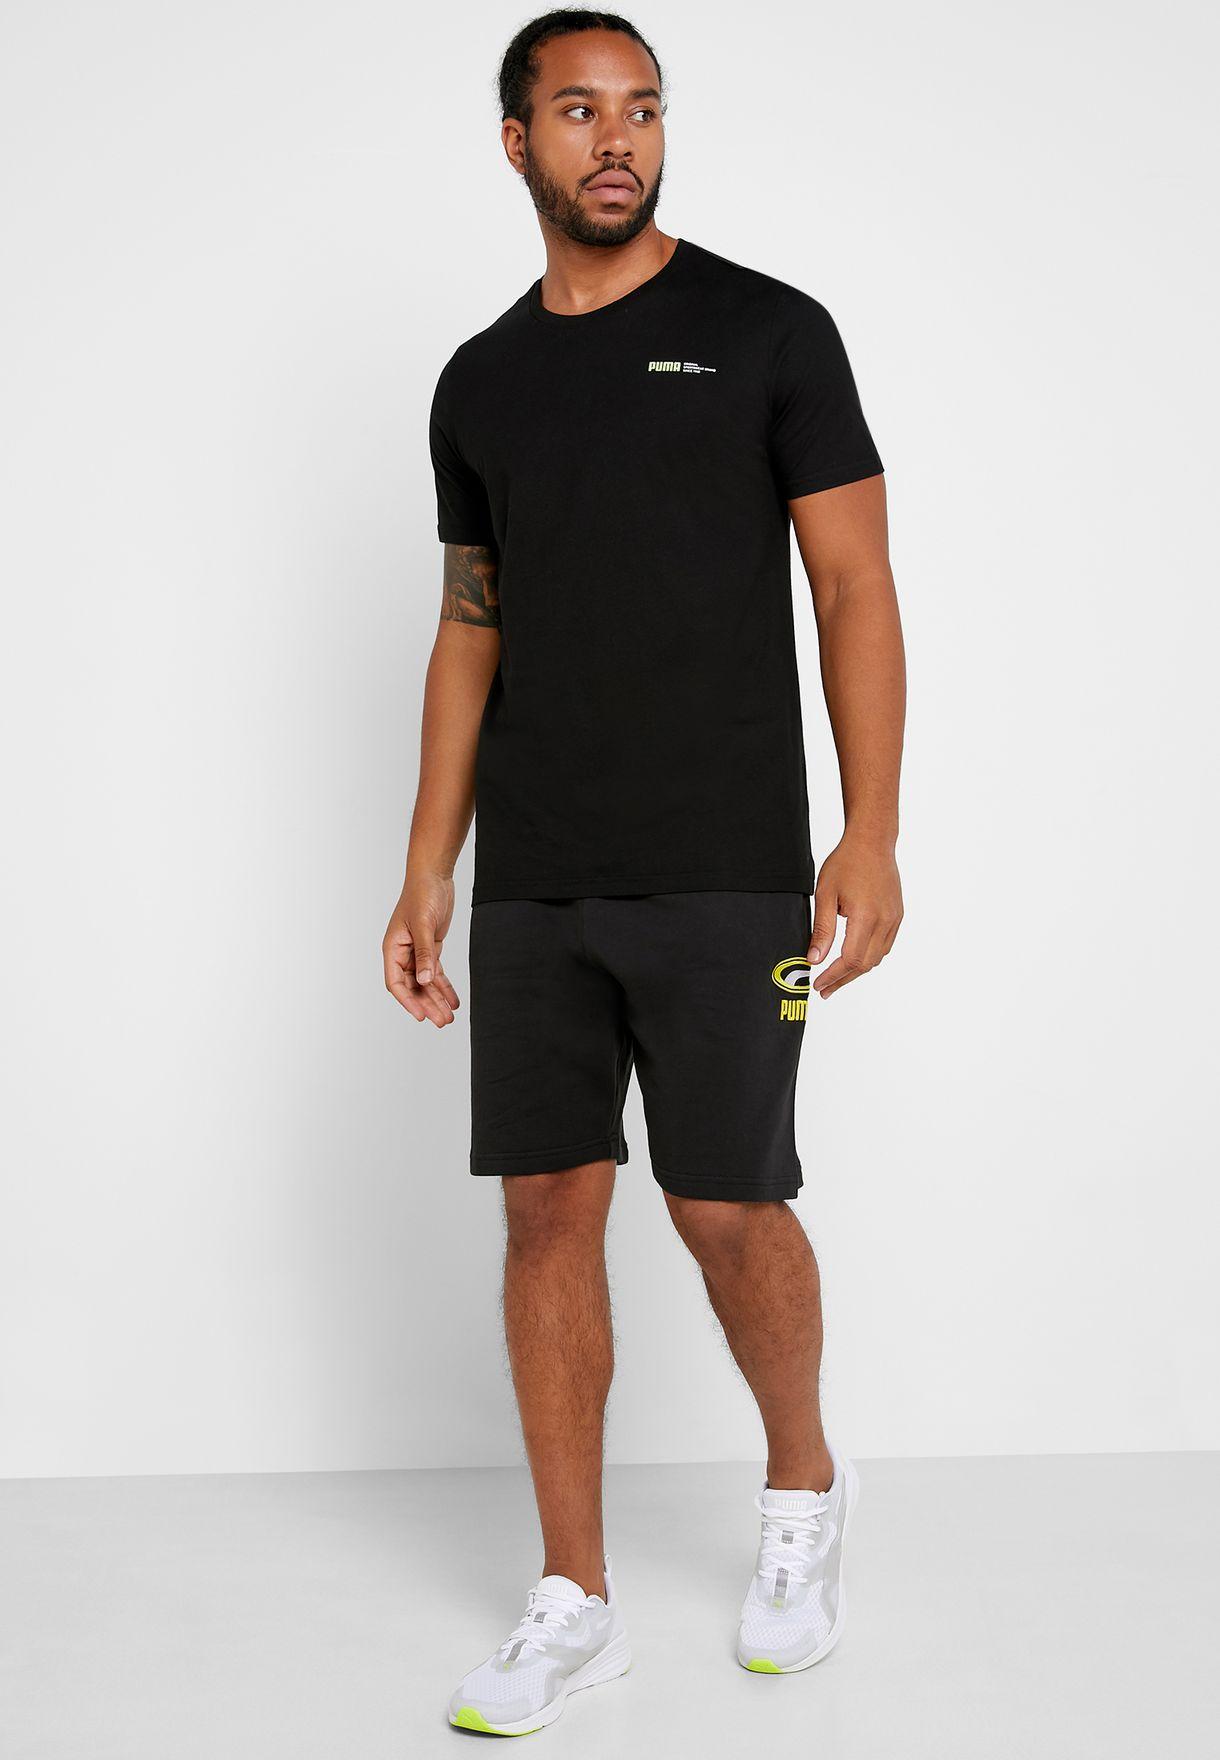 Acidic Pack Graphic T-Shirt